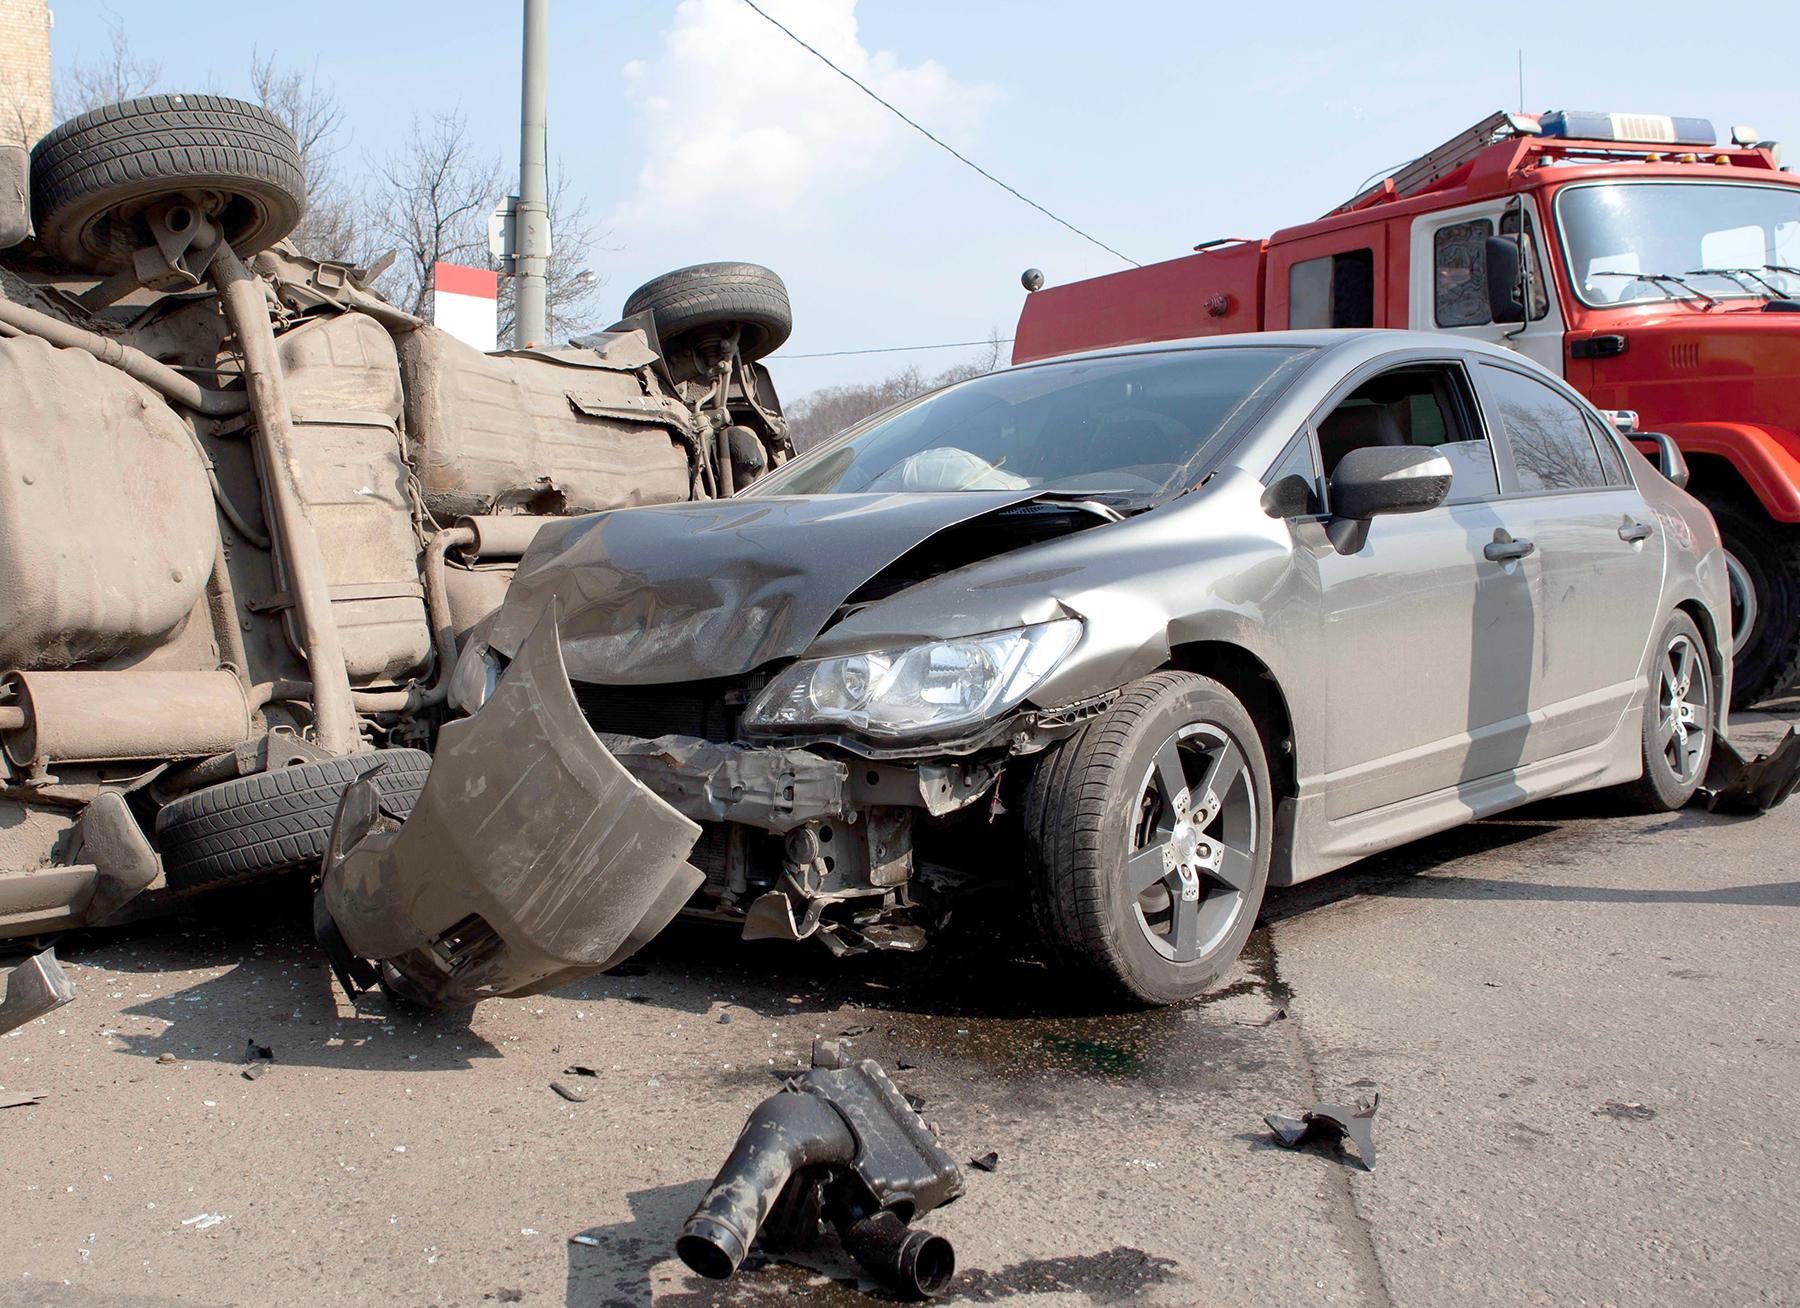 Overturned Vehicle